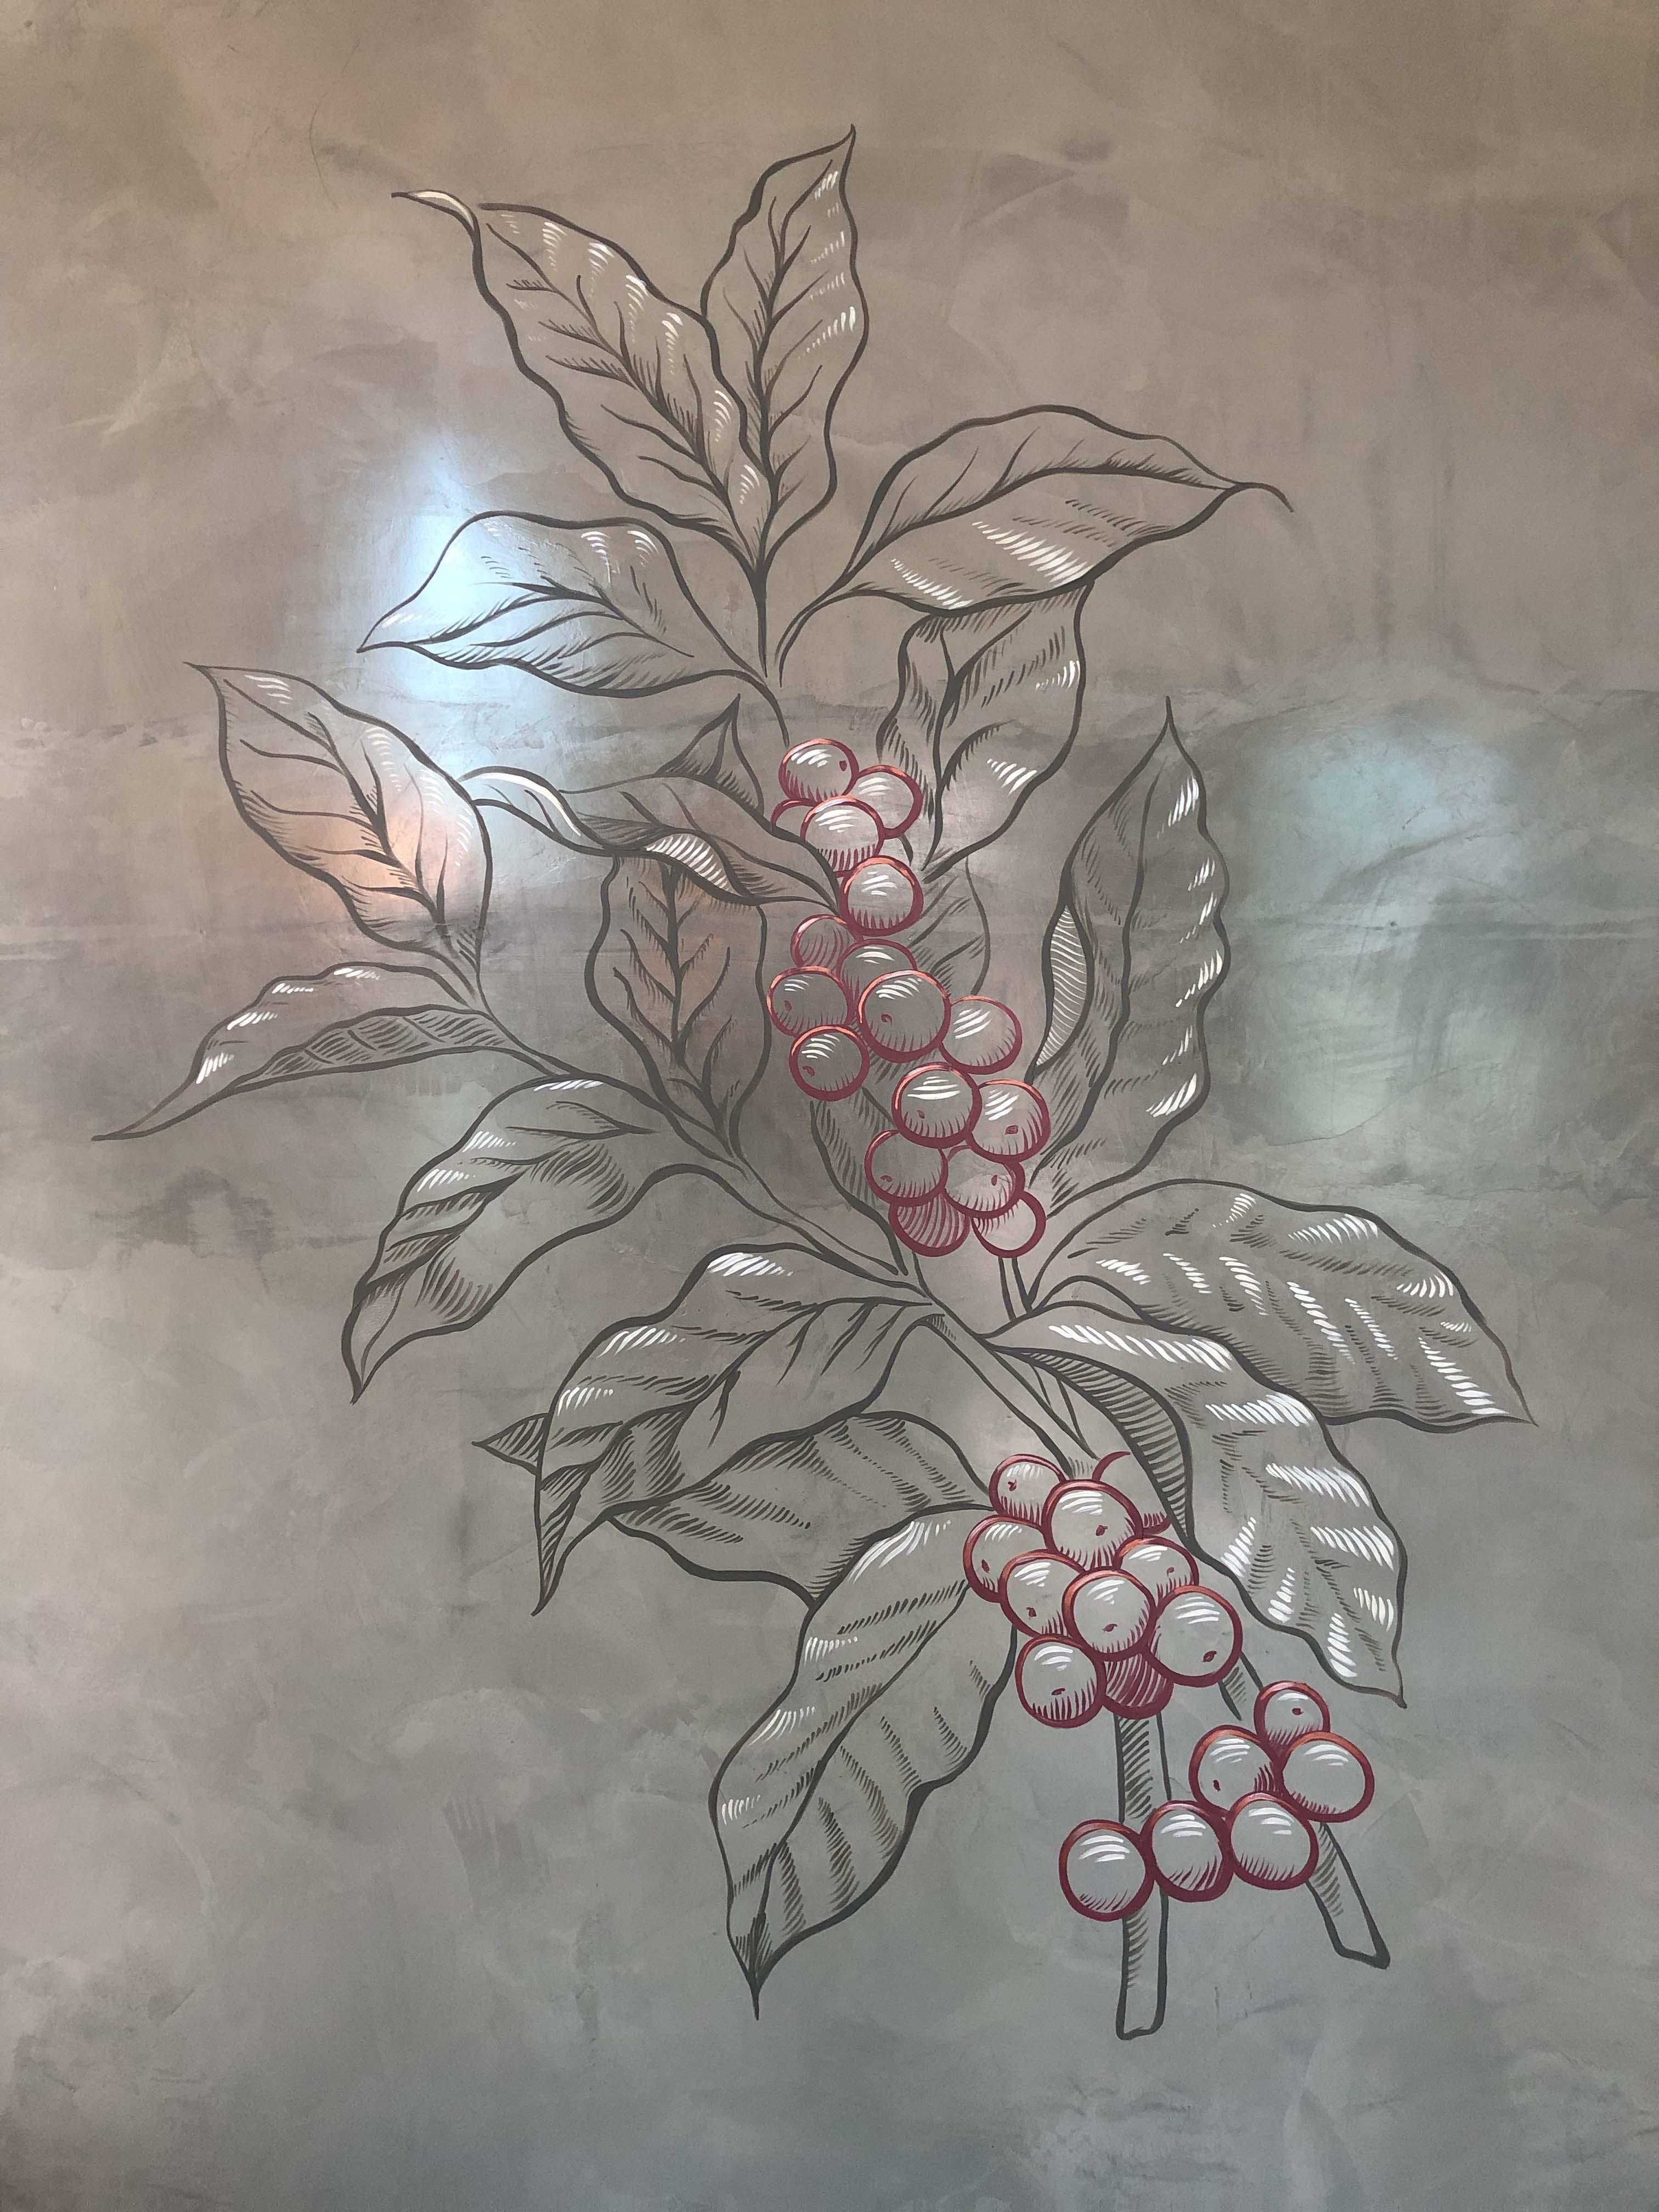 the-art-of-wall-brisbane-south-botanical-coffee-branch-wall-art-mural